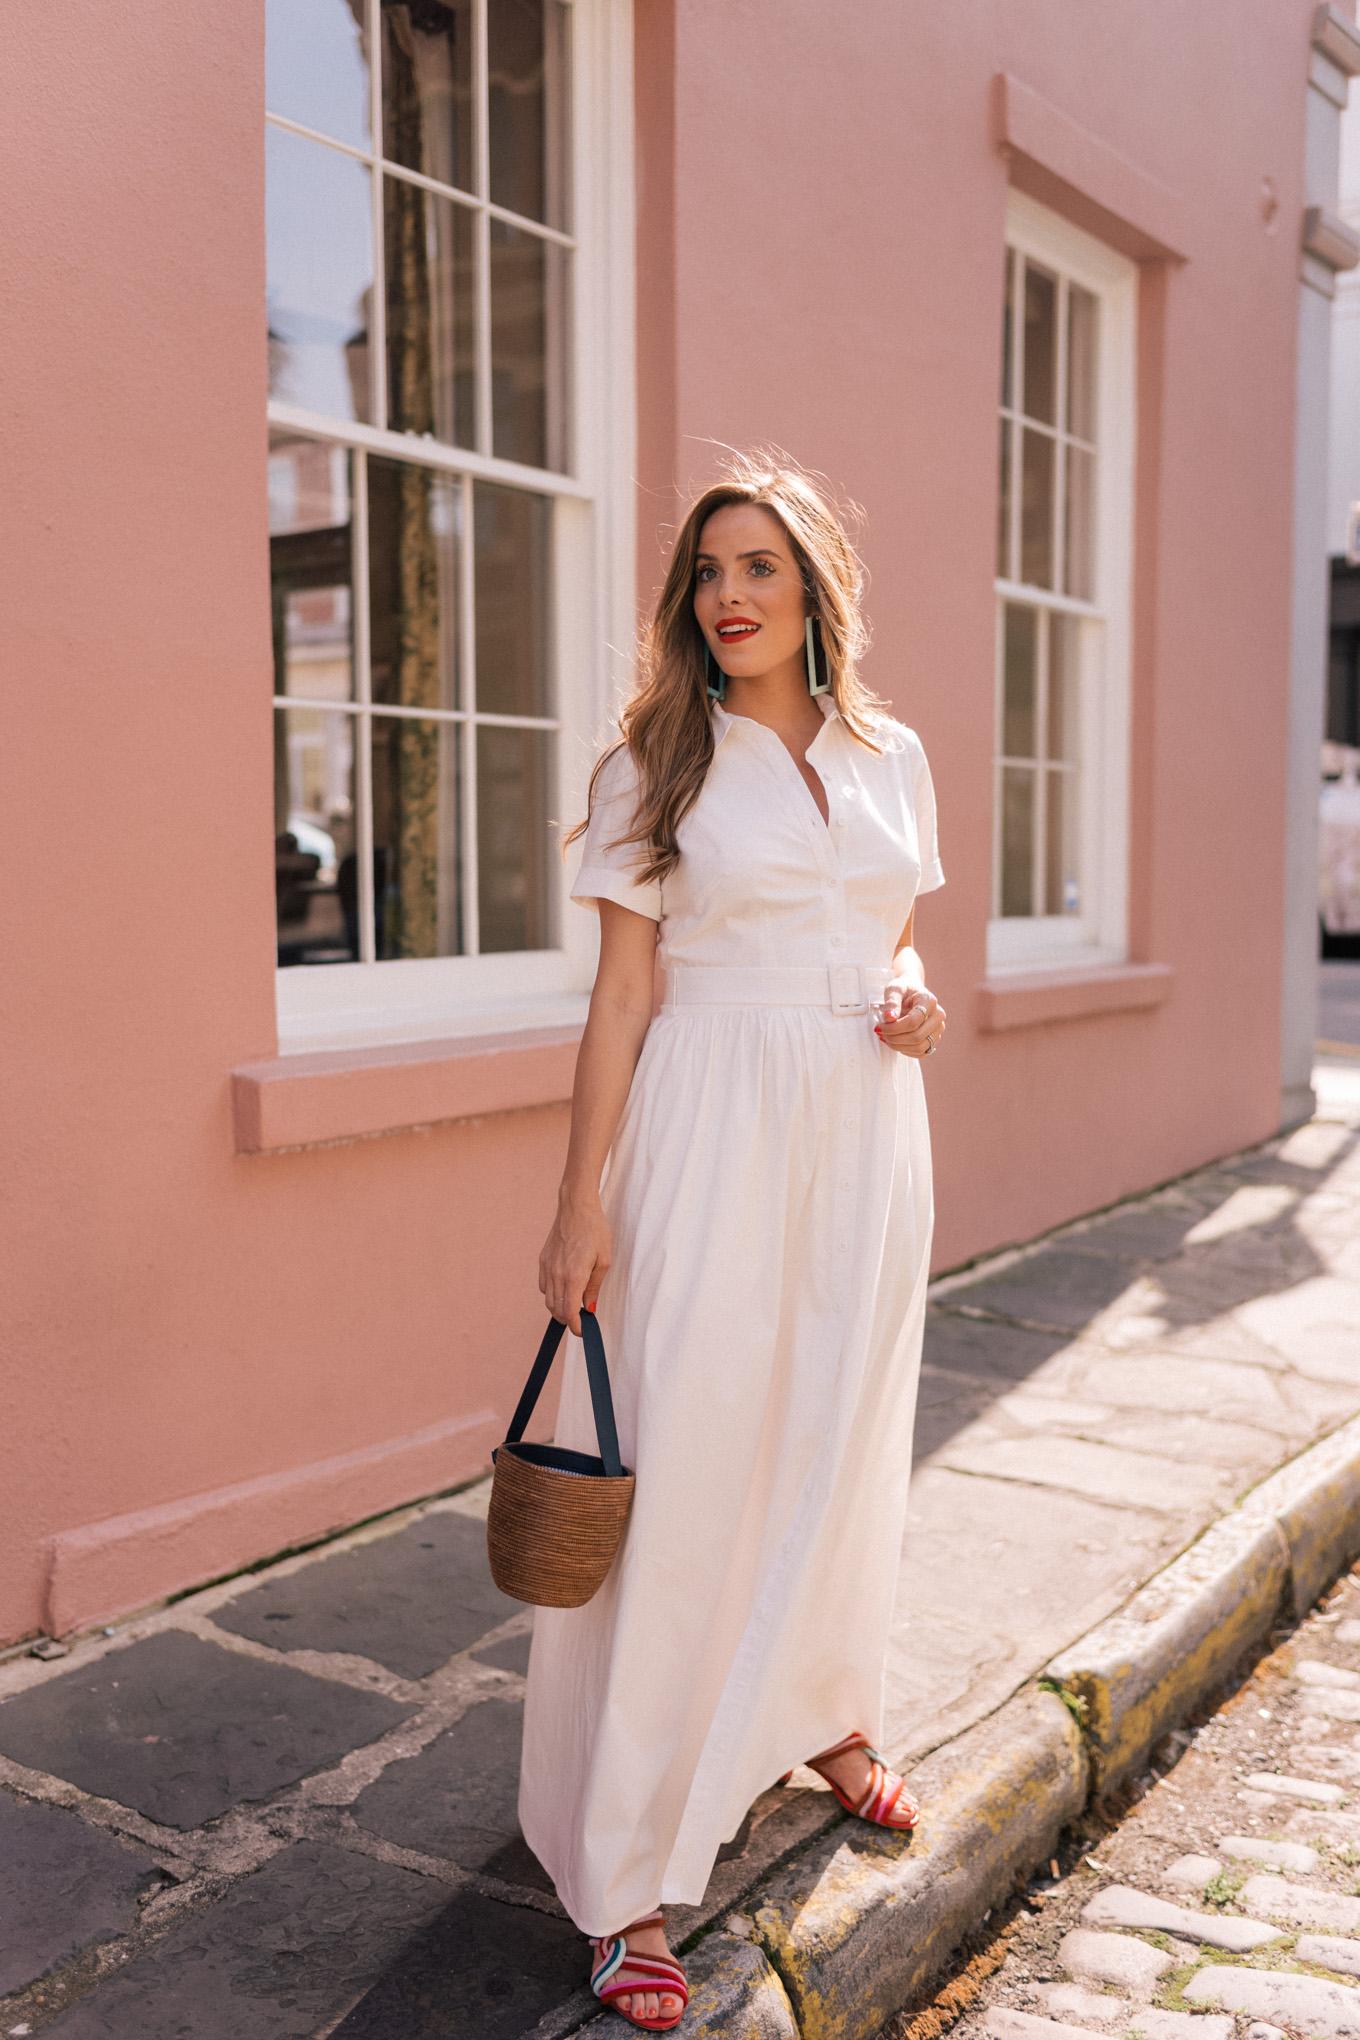 A Classic White Cotton Maxi Shirtdress - Julia Berolzheimer